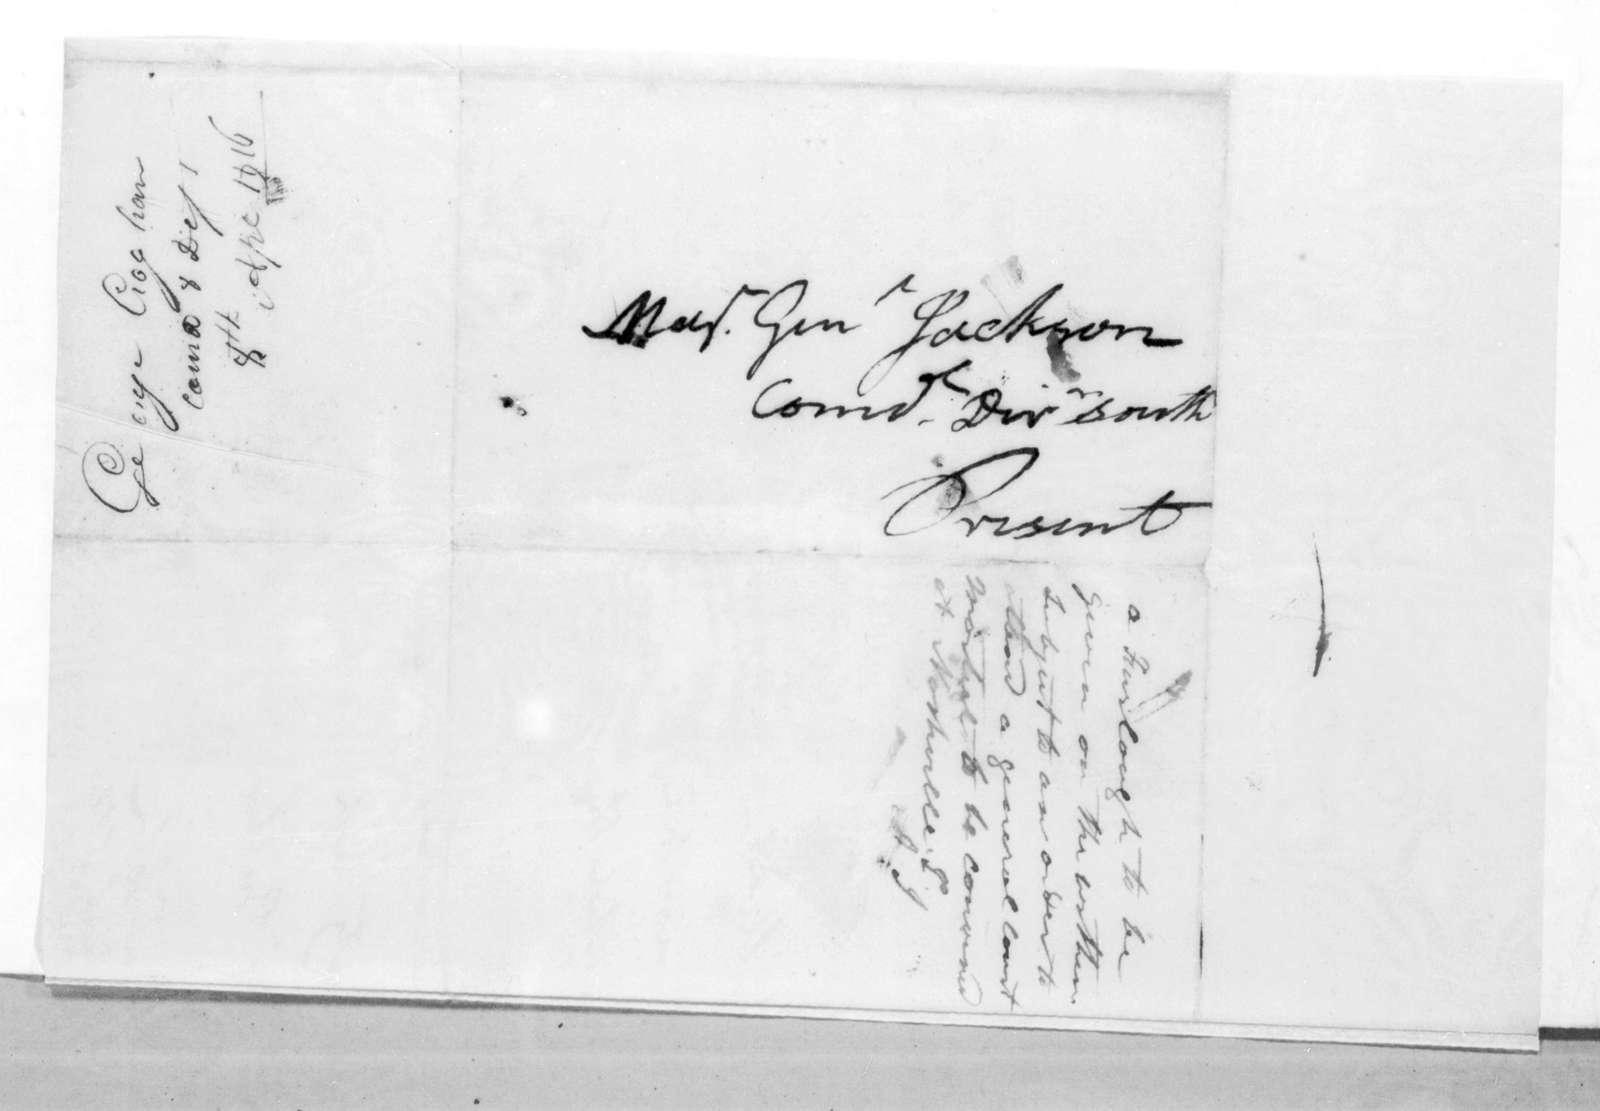 George Croghan to Andrew Jackson, April 8, 1816